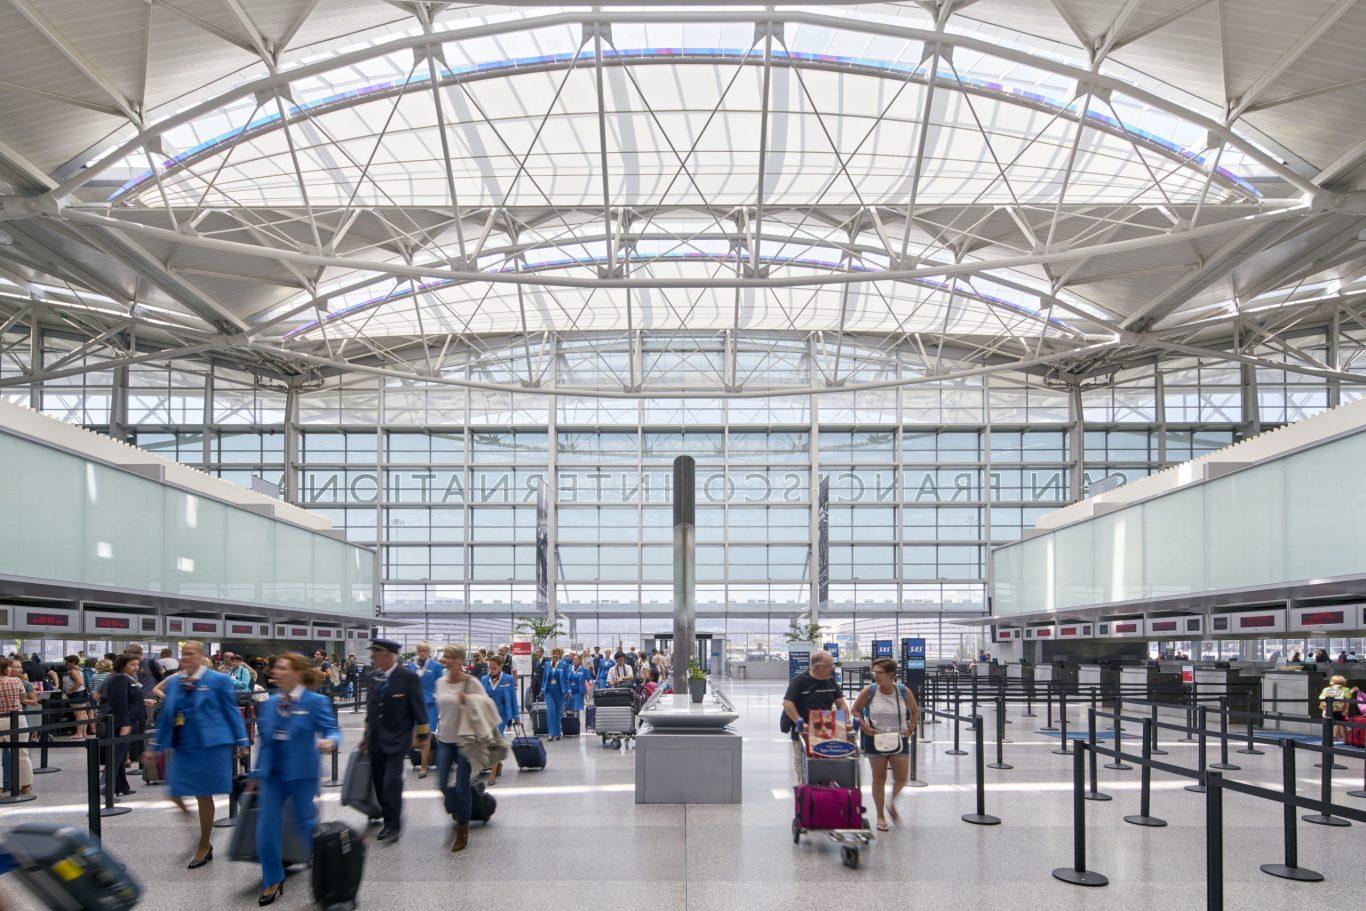 Slide 1 of 1, San Francisco International Airport – International Terminal